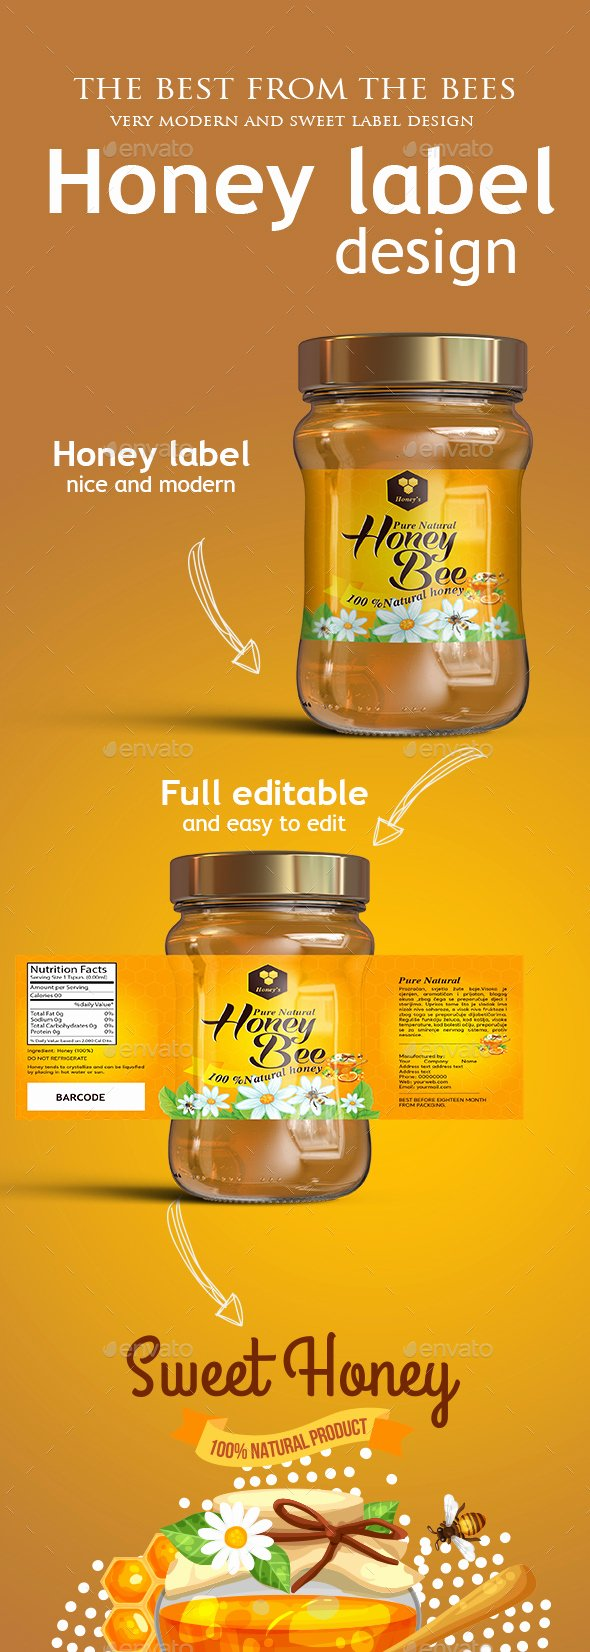 Honey Jar Labels Printable Beautiful Honey Label Template by Muamer24